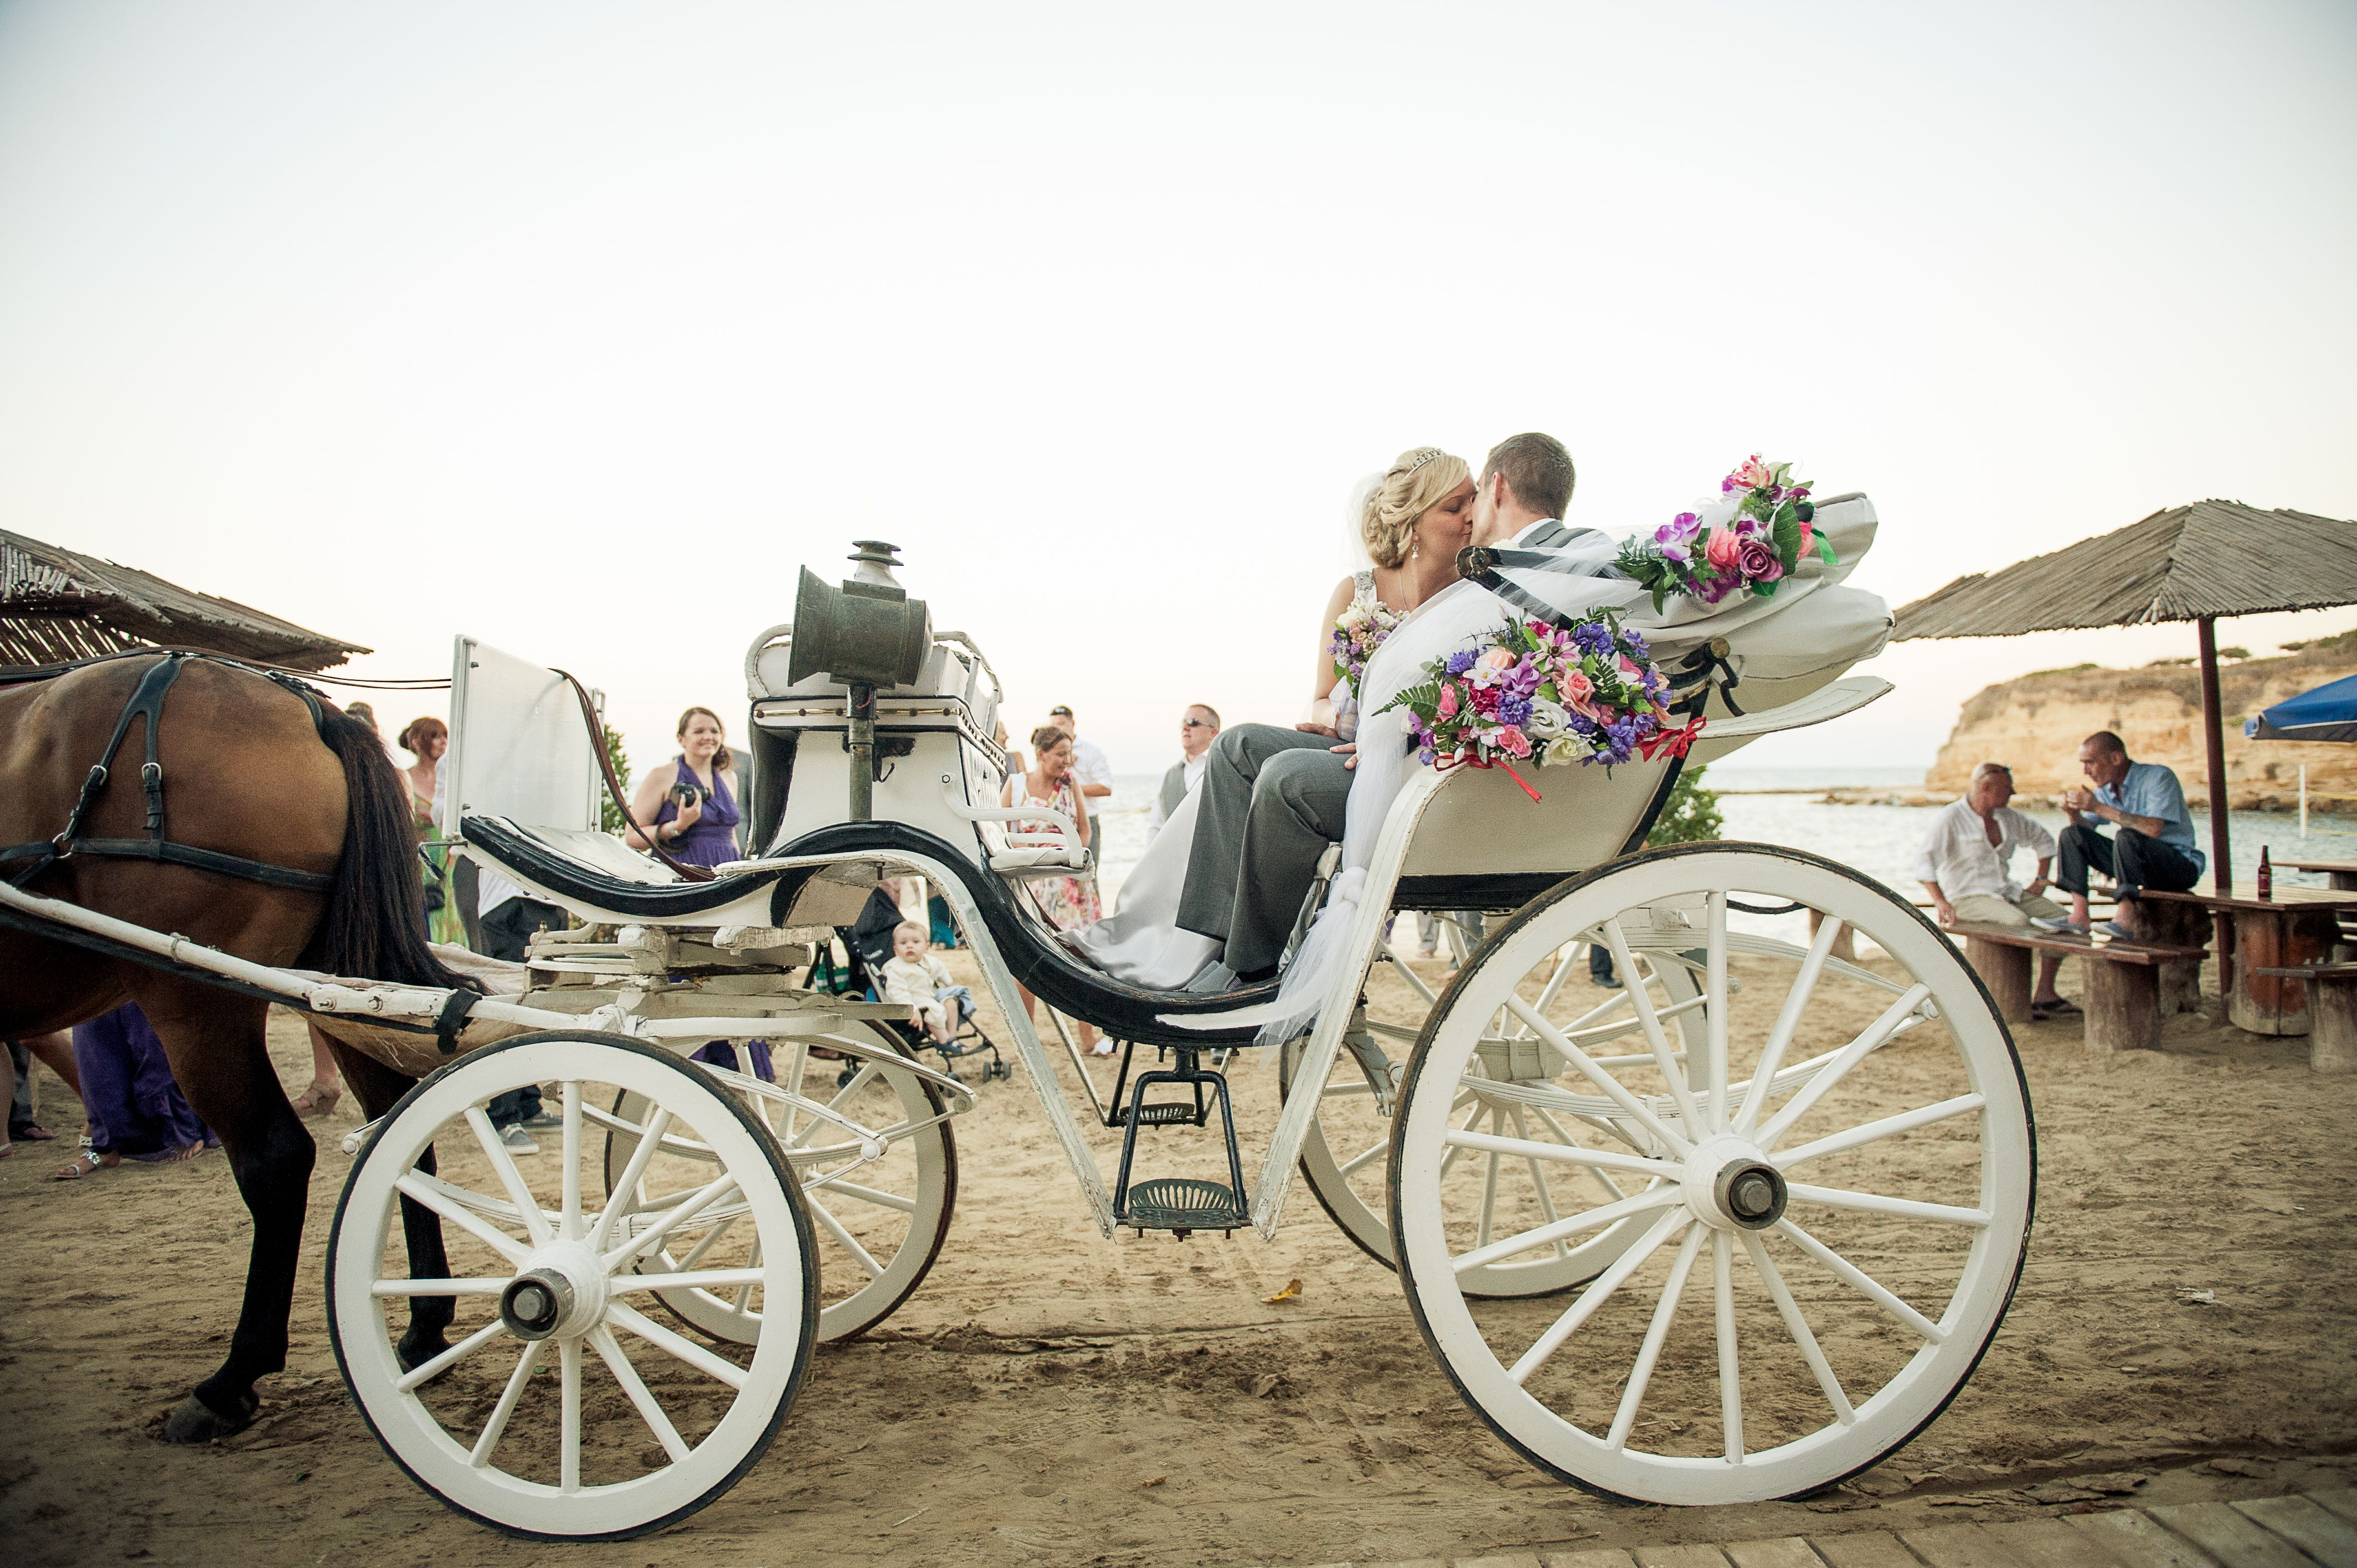 Horse & Carriage | 3.15.15 <3 | Pinterest | Weddings